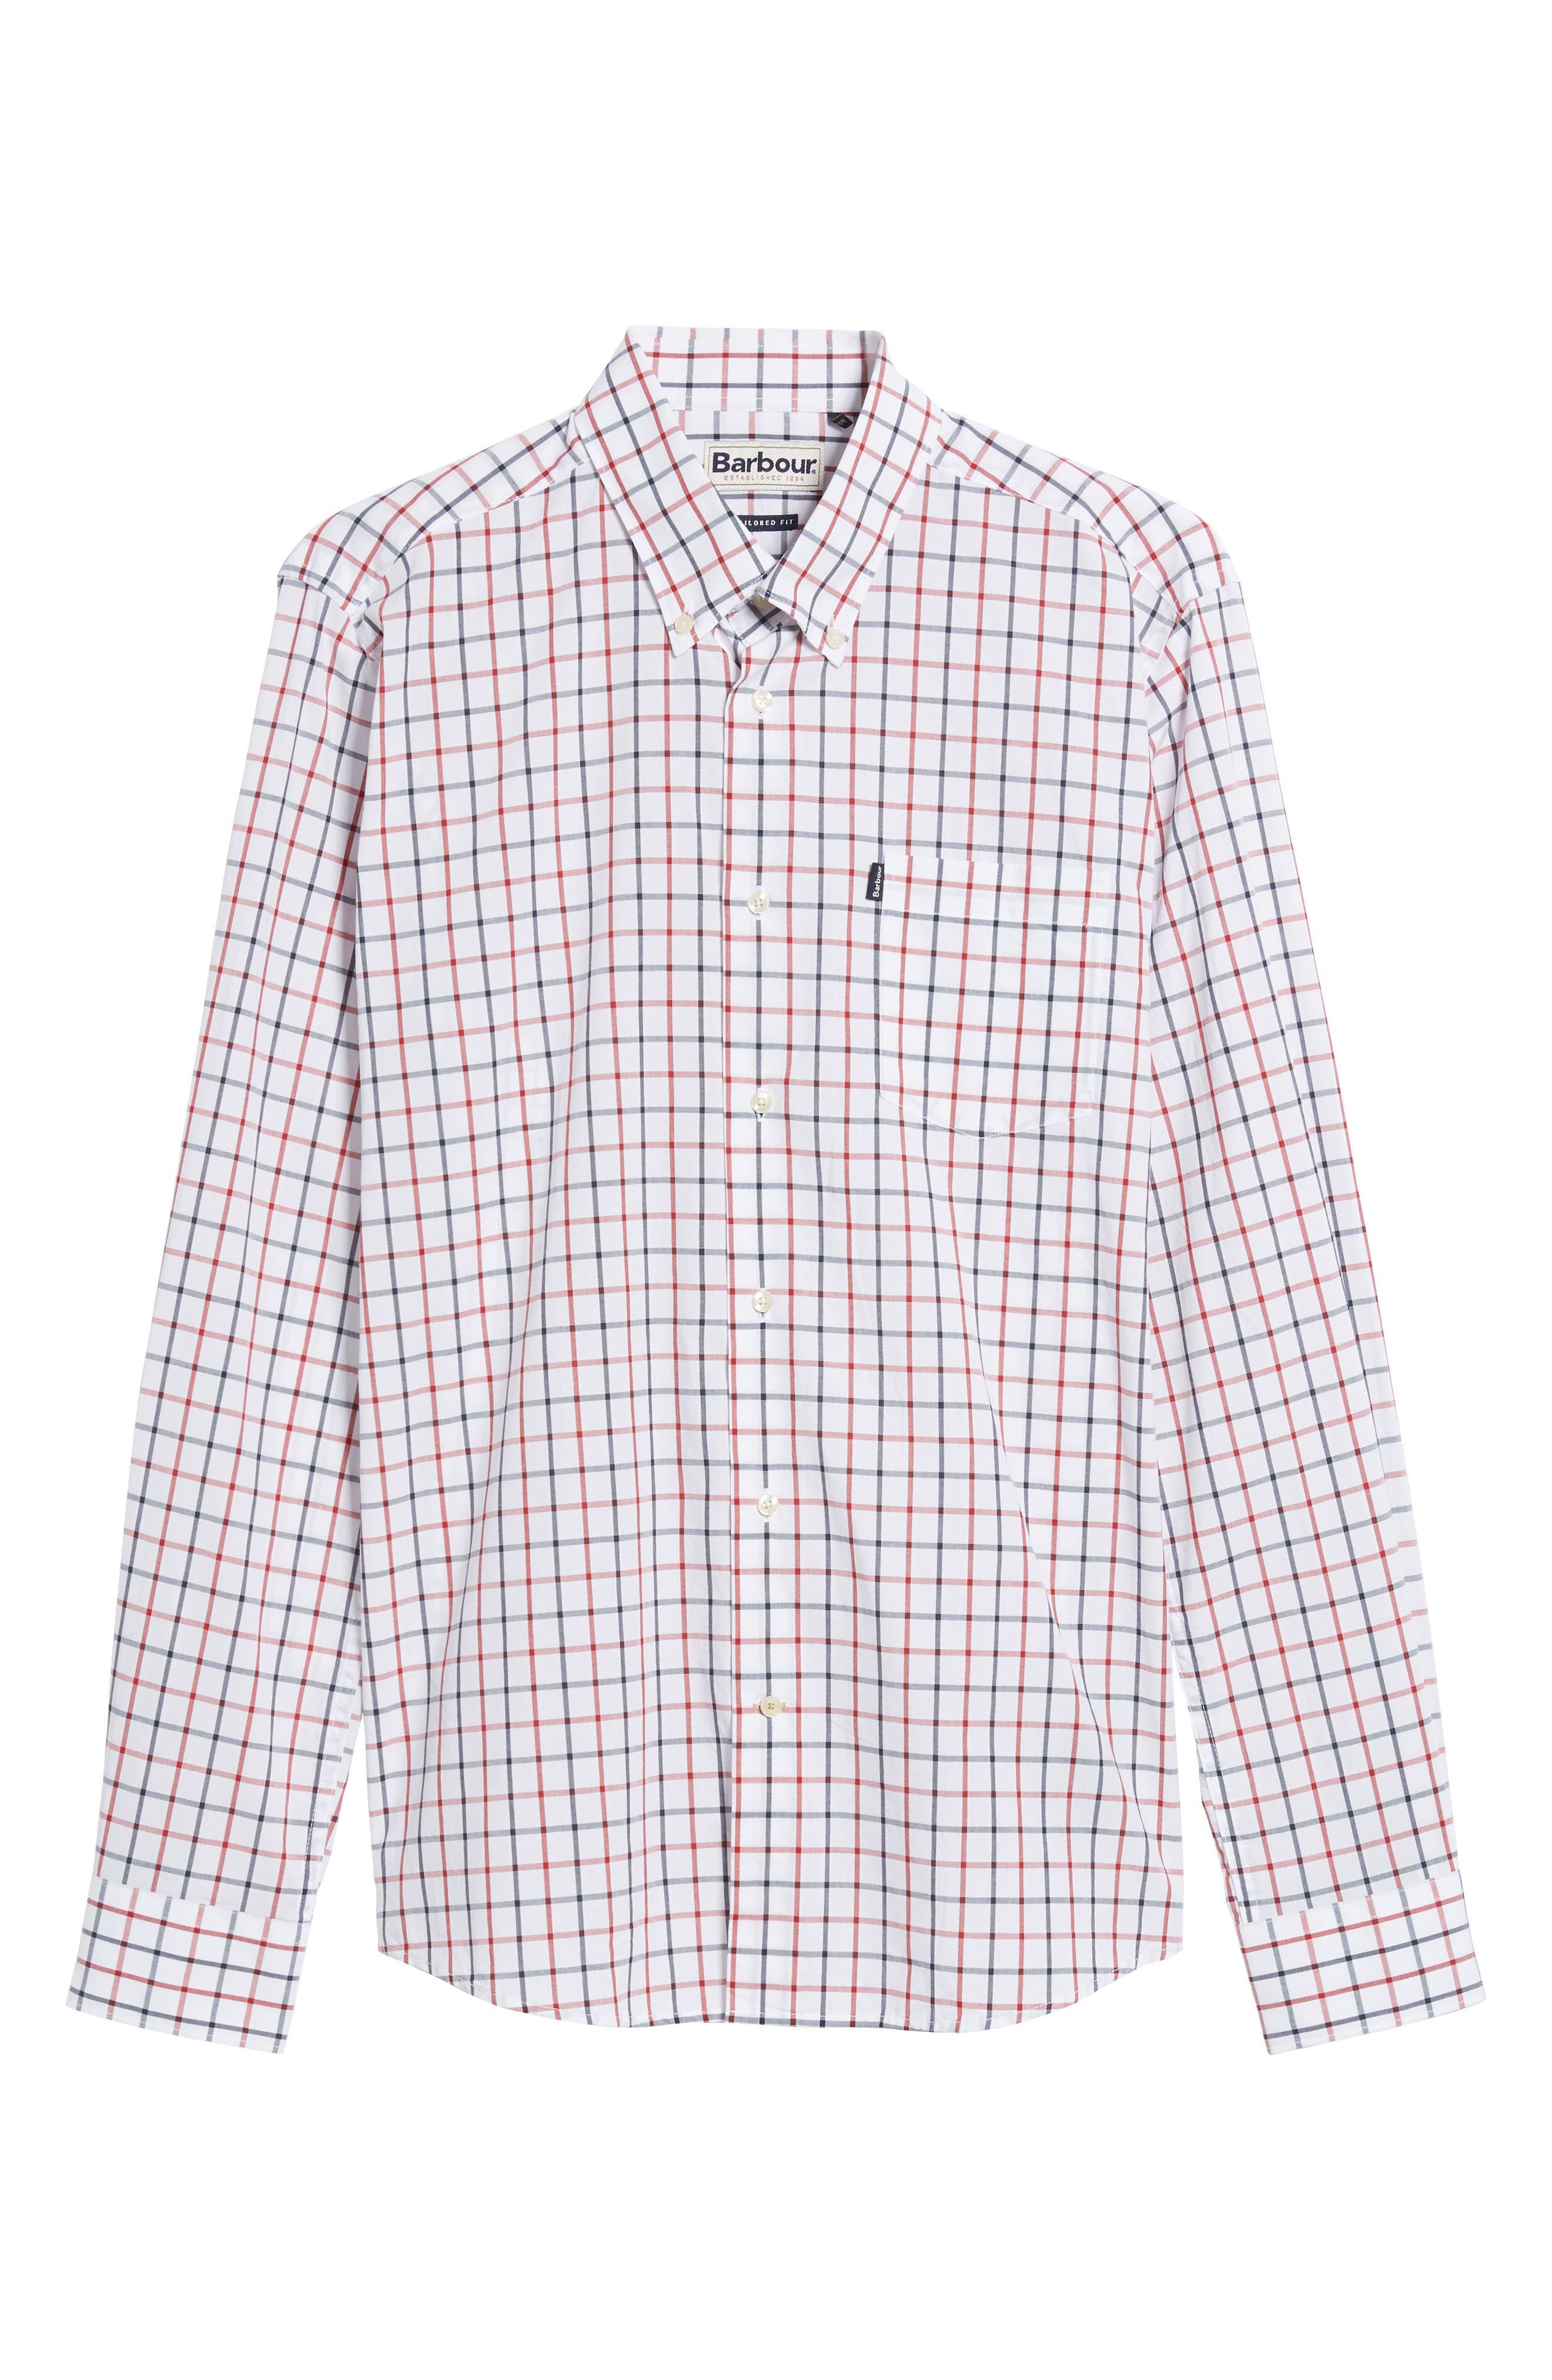 Henry Trim Fit Check Short Sleeve Sport Shirt,                             Alternate thumbnail 6, color,                             White